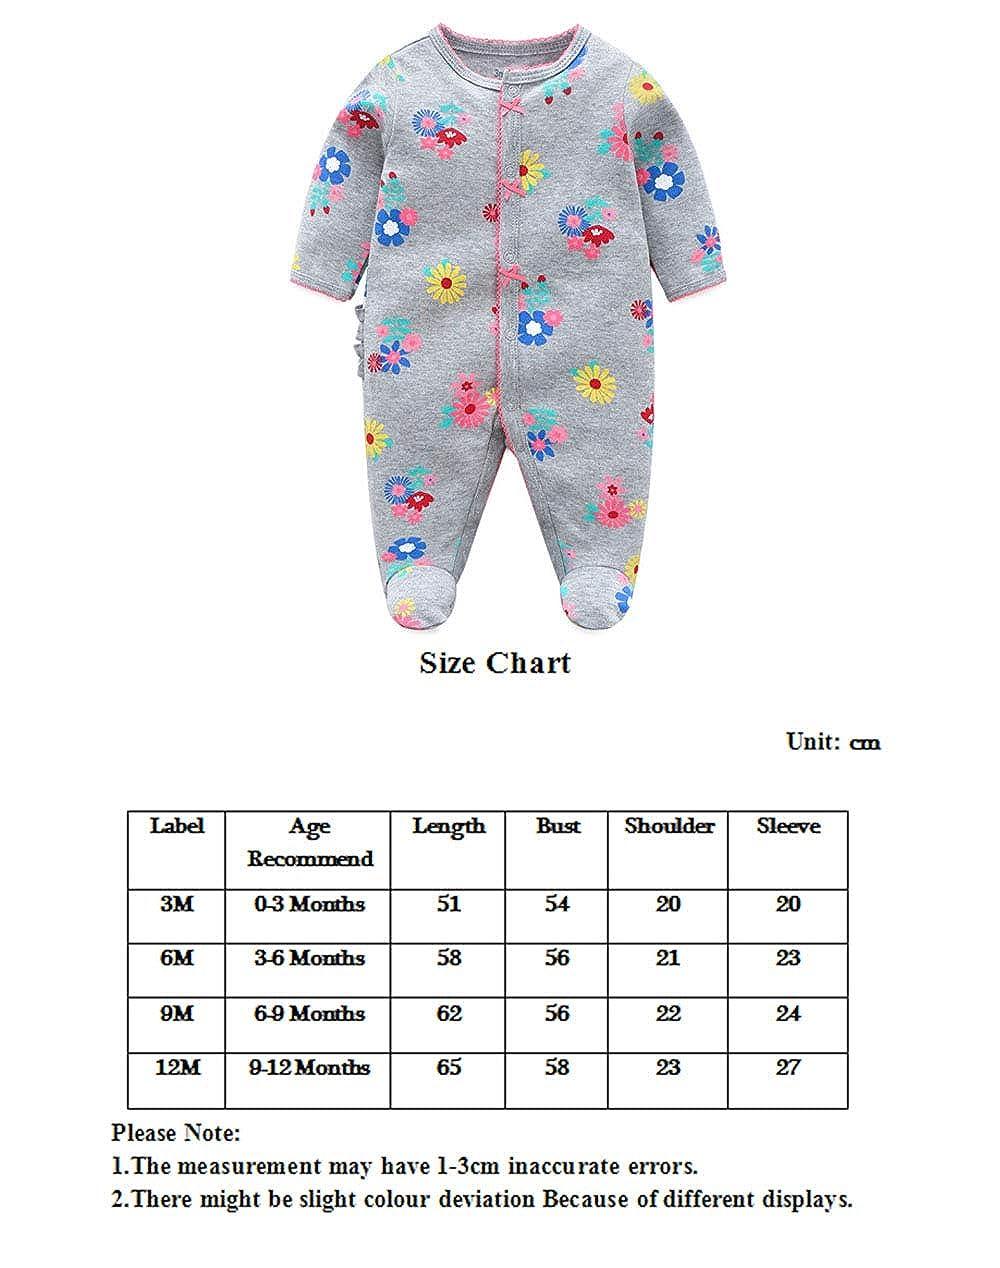 Reci/én Nacido Pijama Beb/é Pelele Ni/ñas Mameluco Algod/ón Caricatura Trajes 0-12 Meses